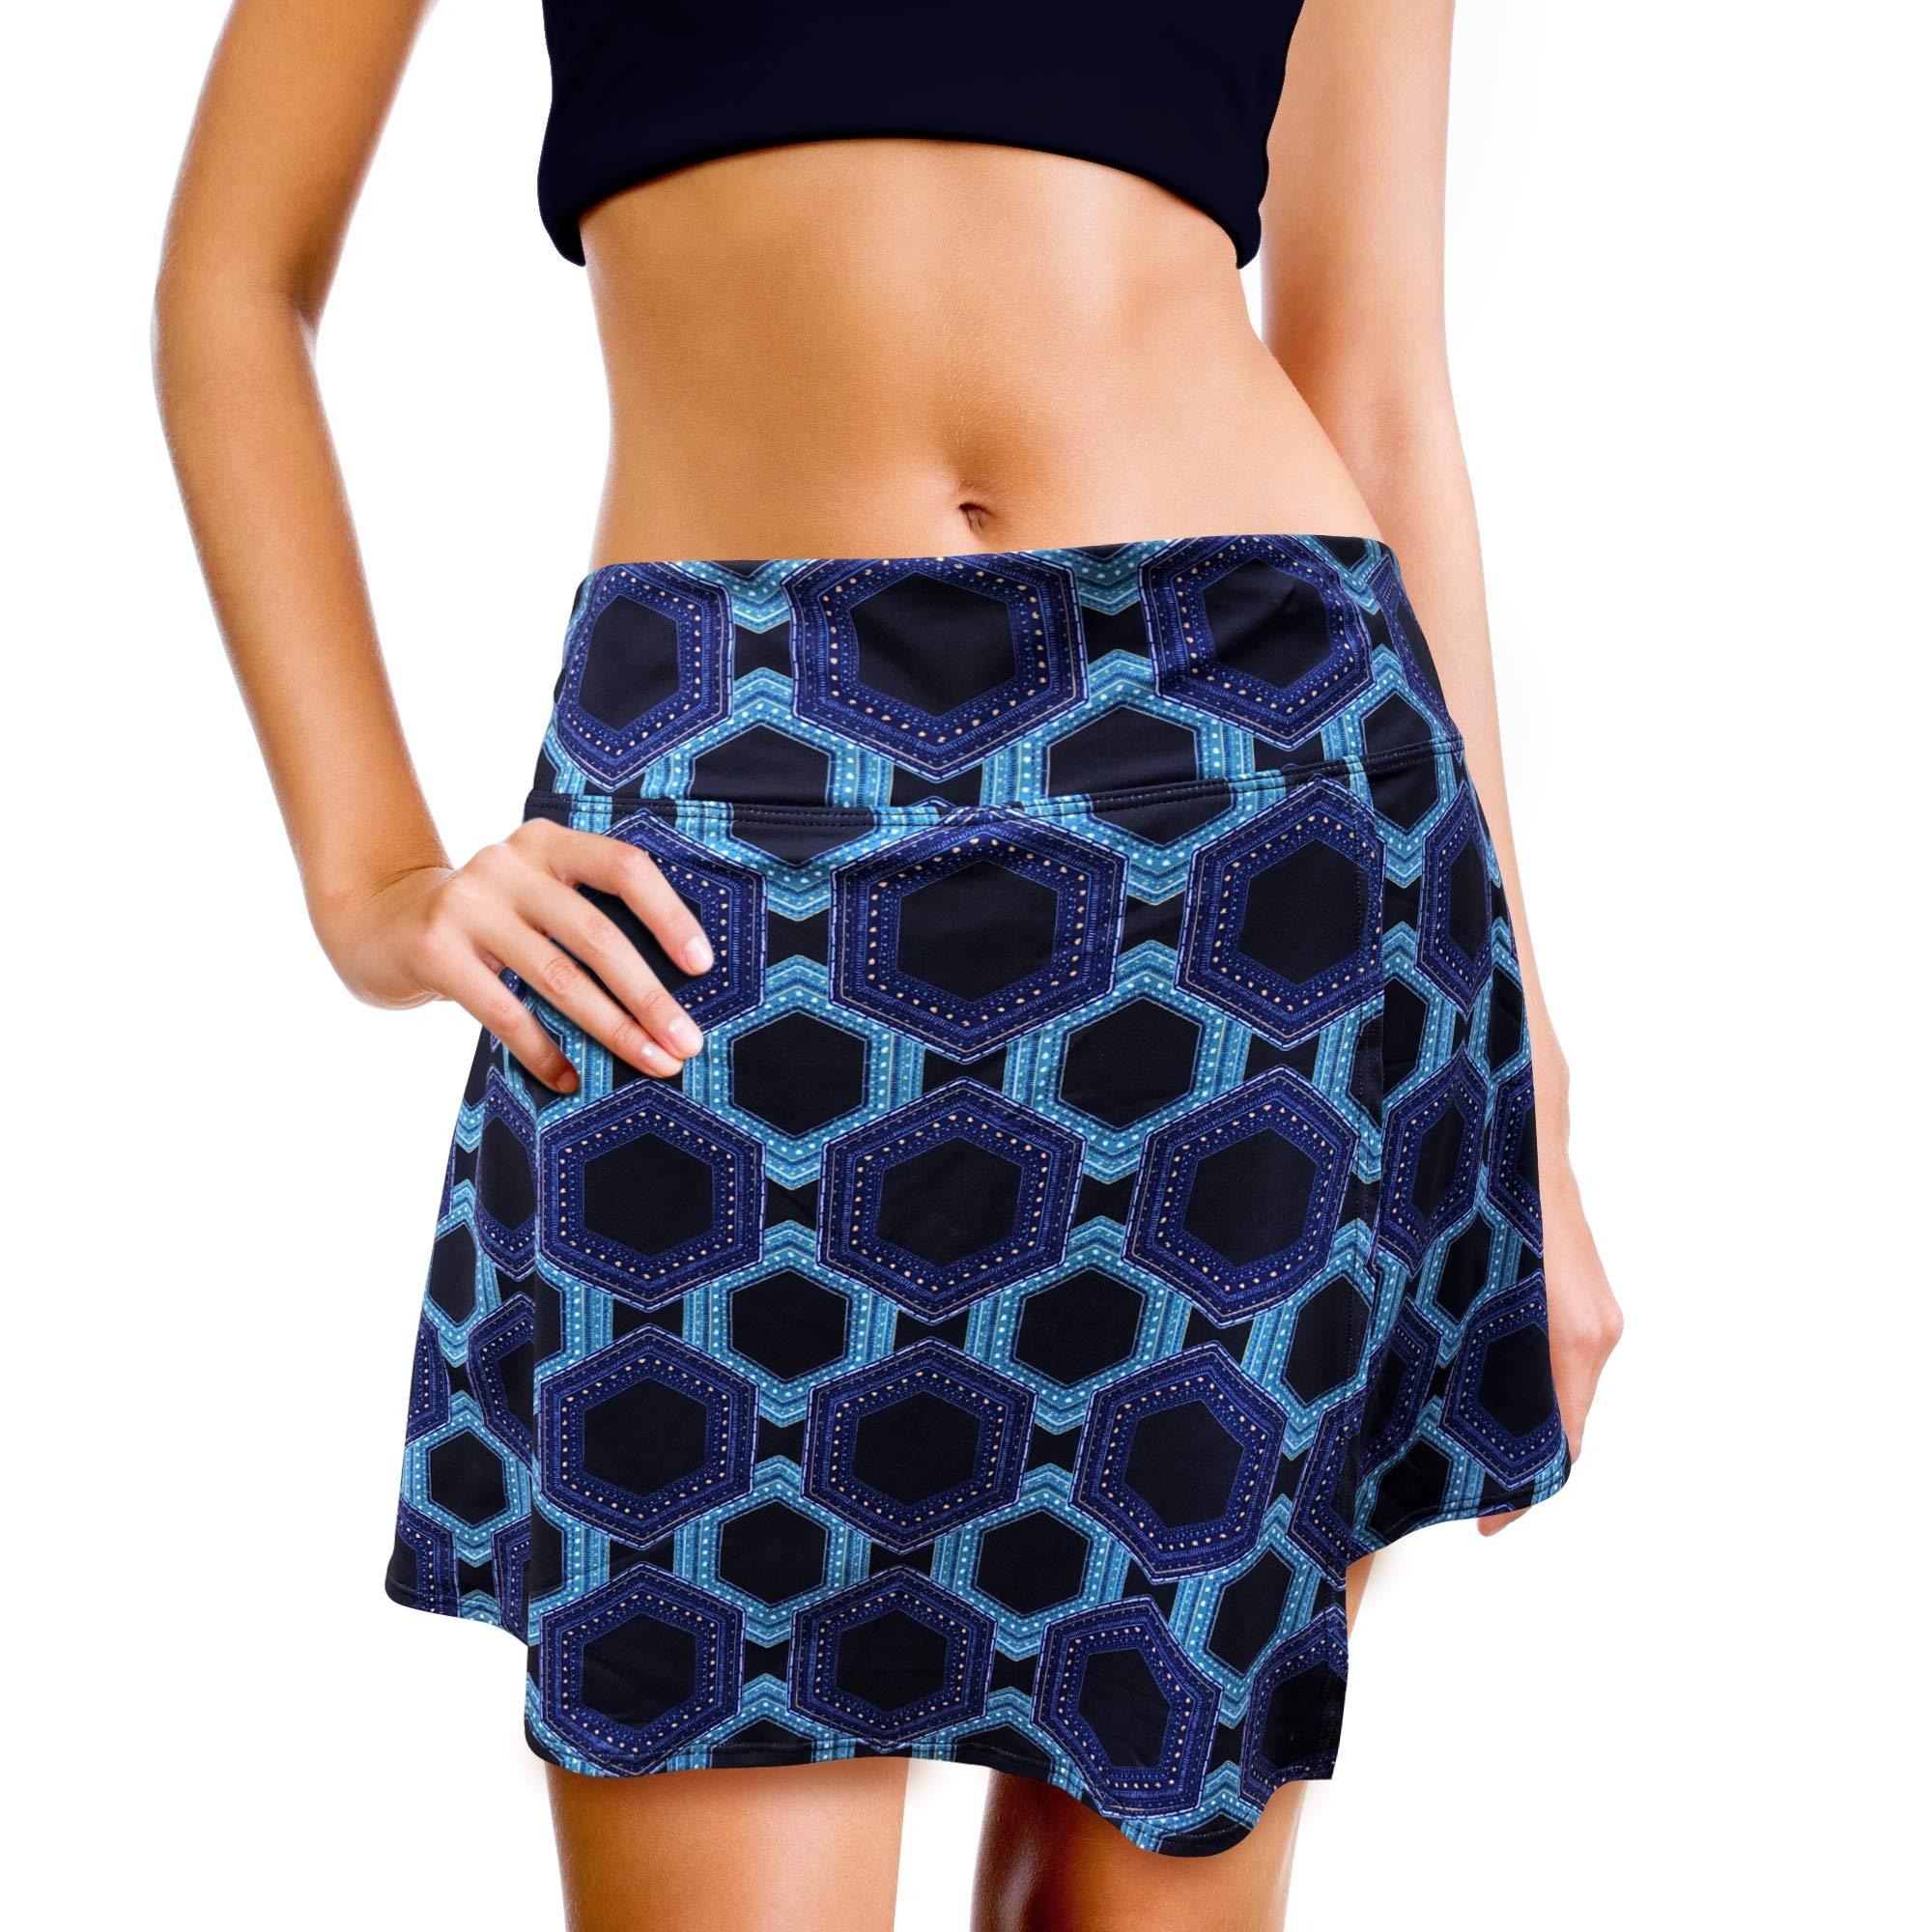 XrSzChic Womens Tennis Golf Skorts Skirt Athletic Exercise Printed Short Pockets by XrSzChic